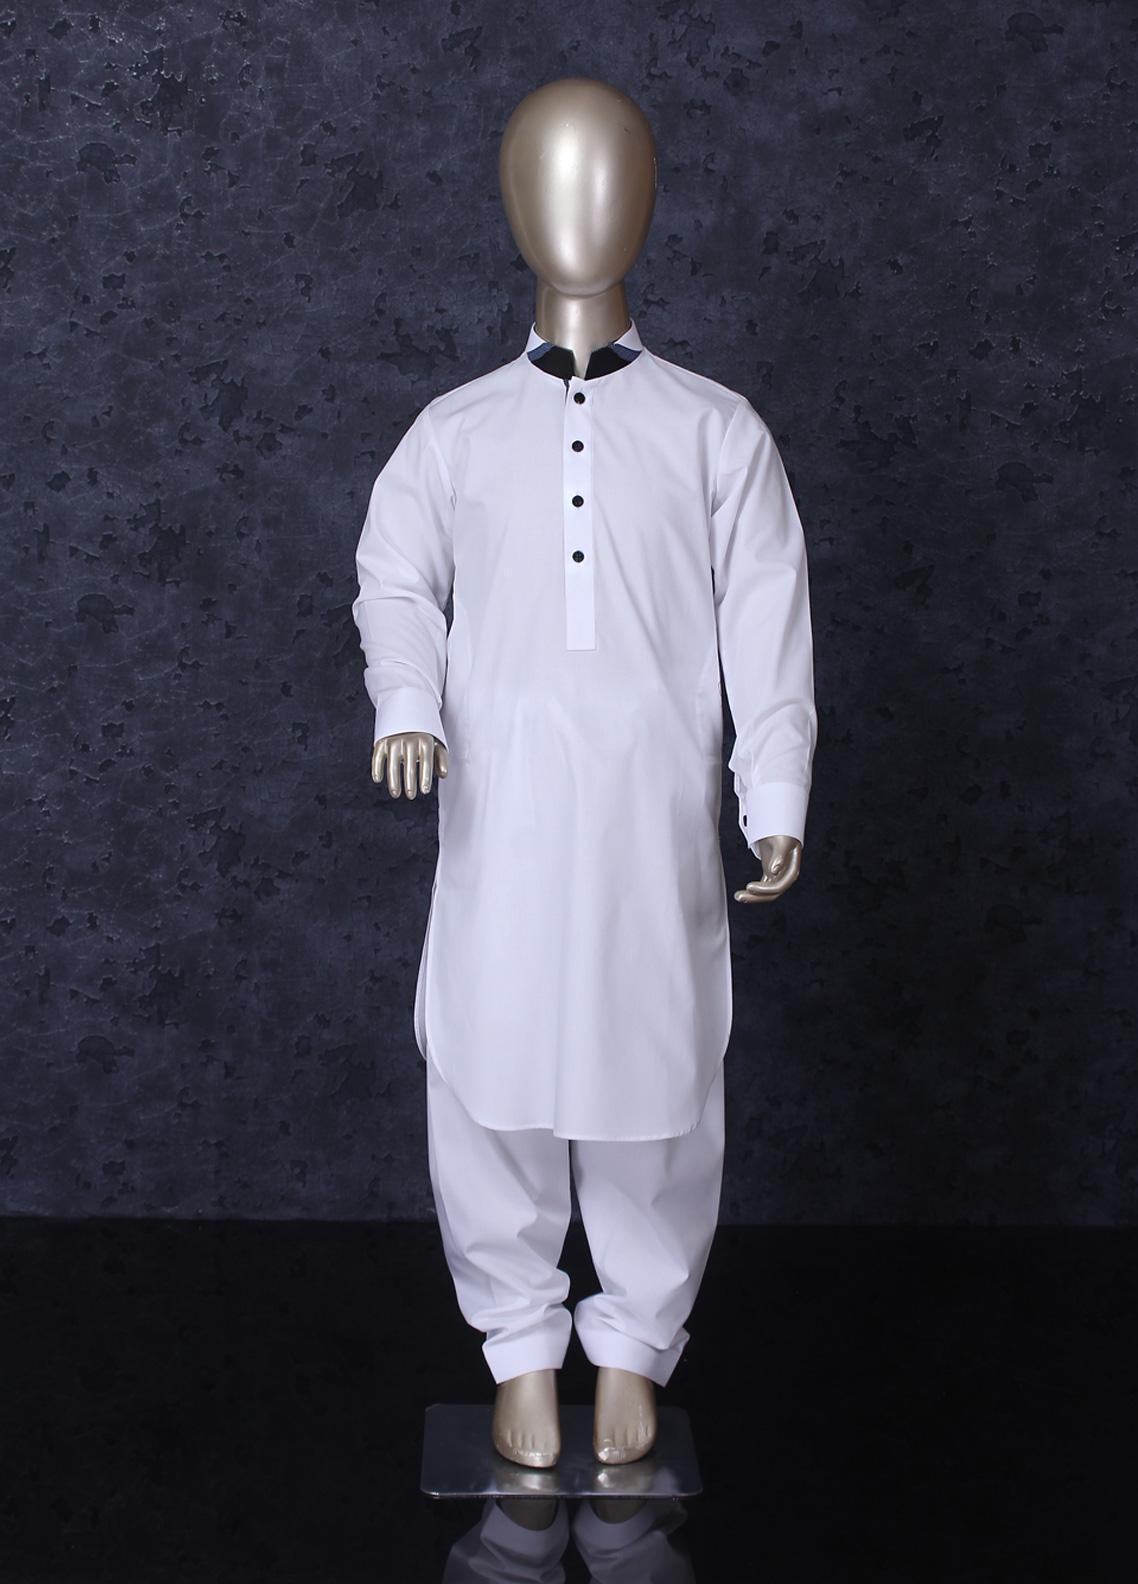 Aizaz Zafar Cotton Formal Boys Kameez Shalwar -  255 White